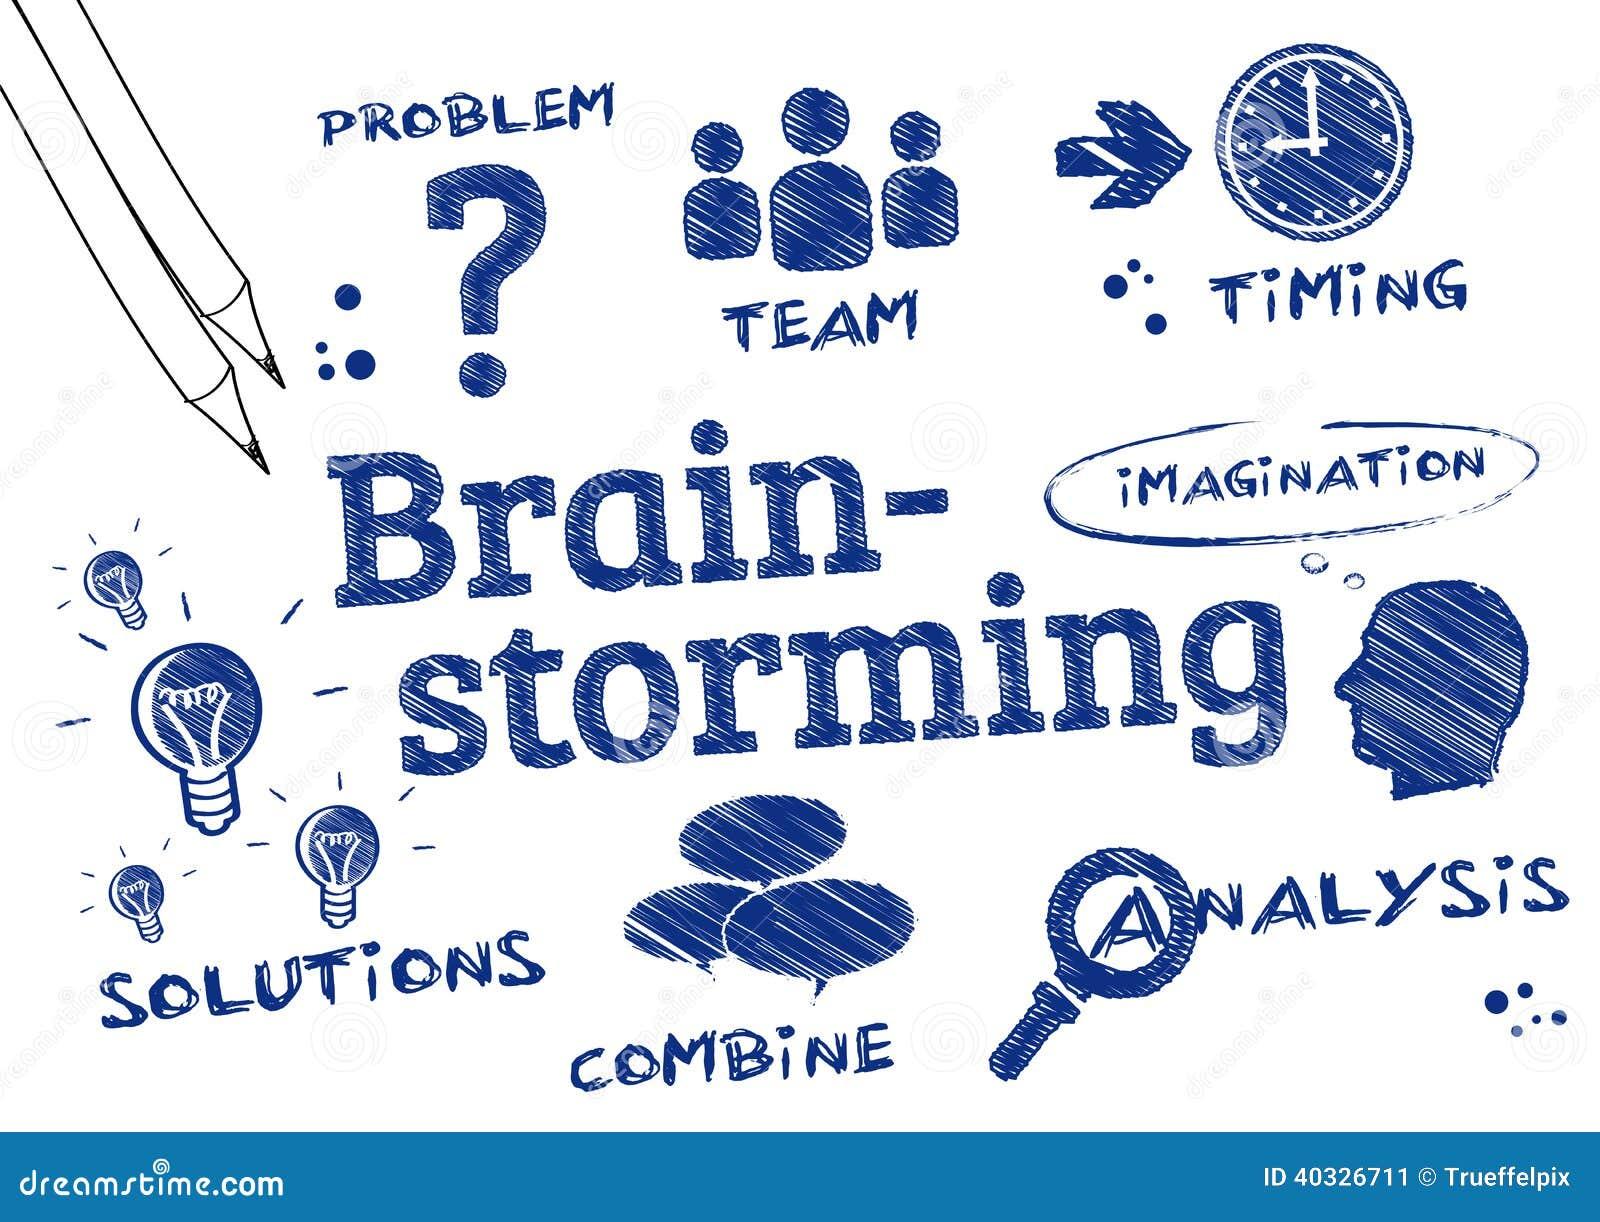 Brainstorming Problem Solving Scribble Stock